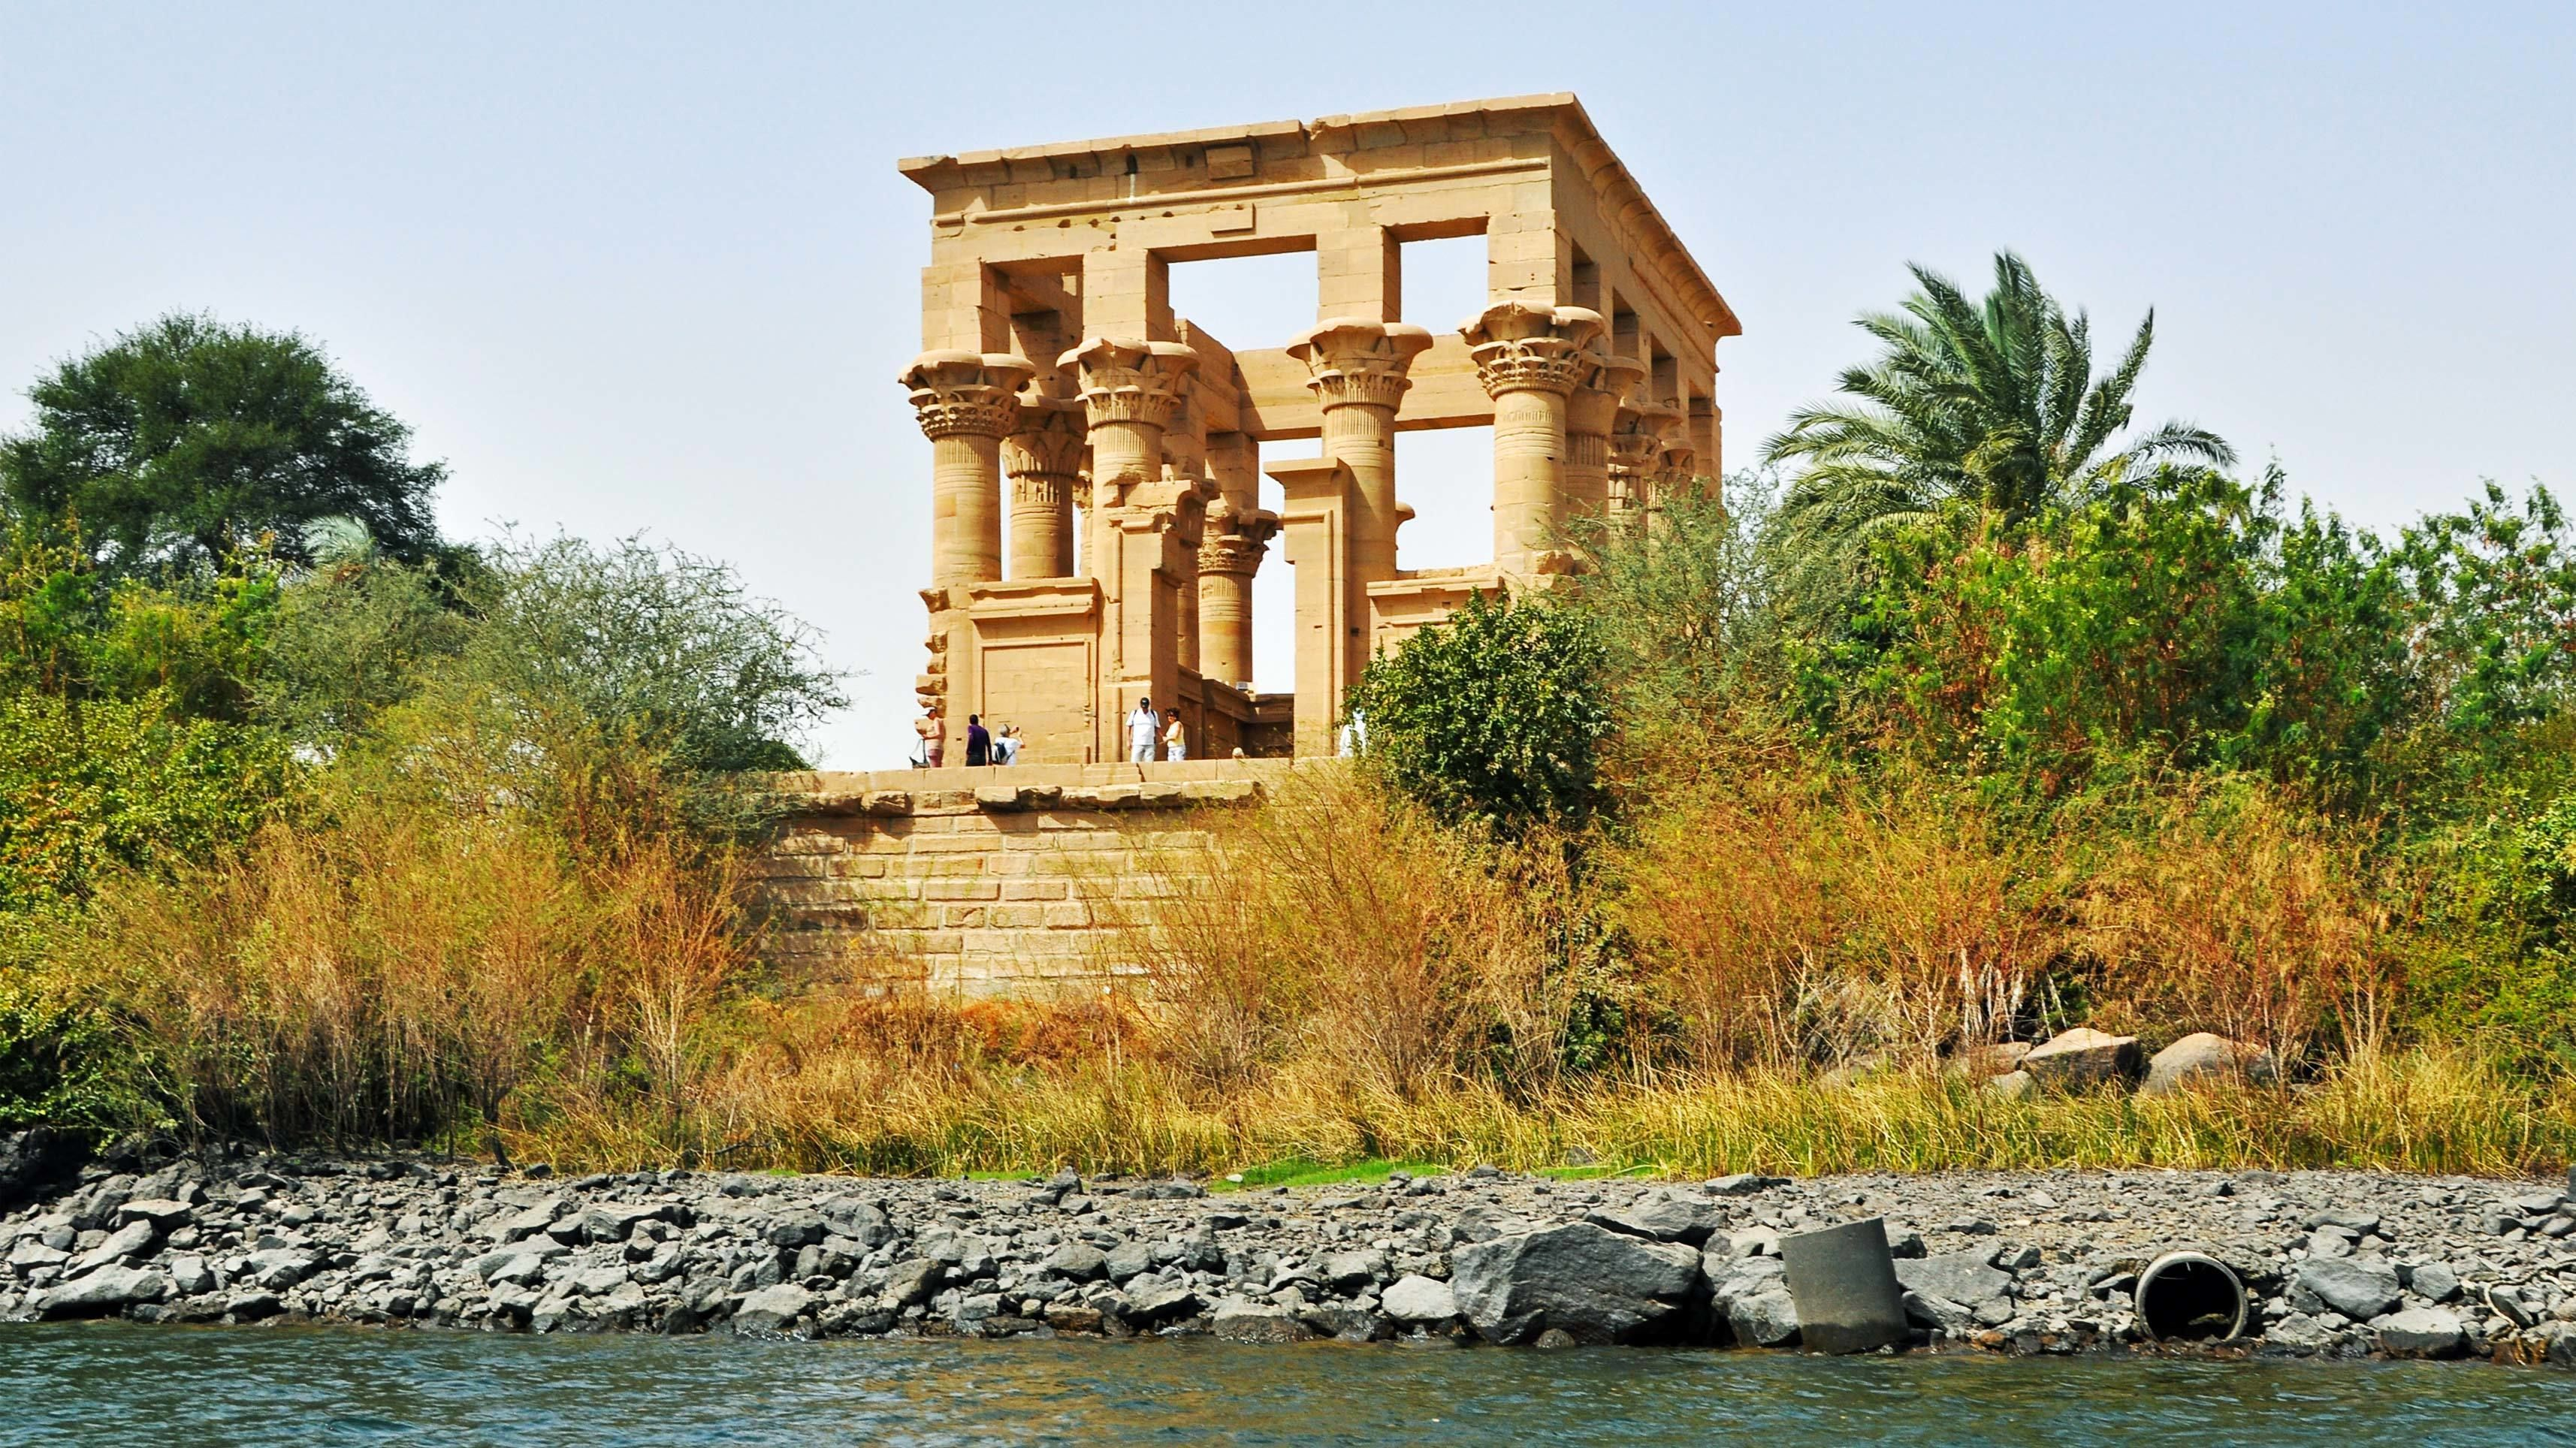 Trajan's Kiosk on the island of Philae in Aswan